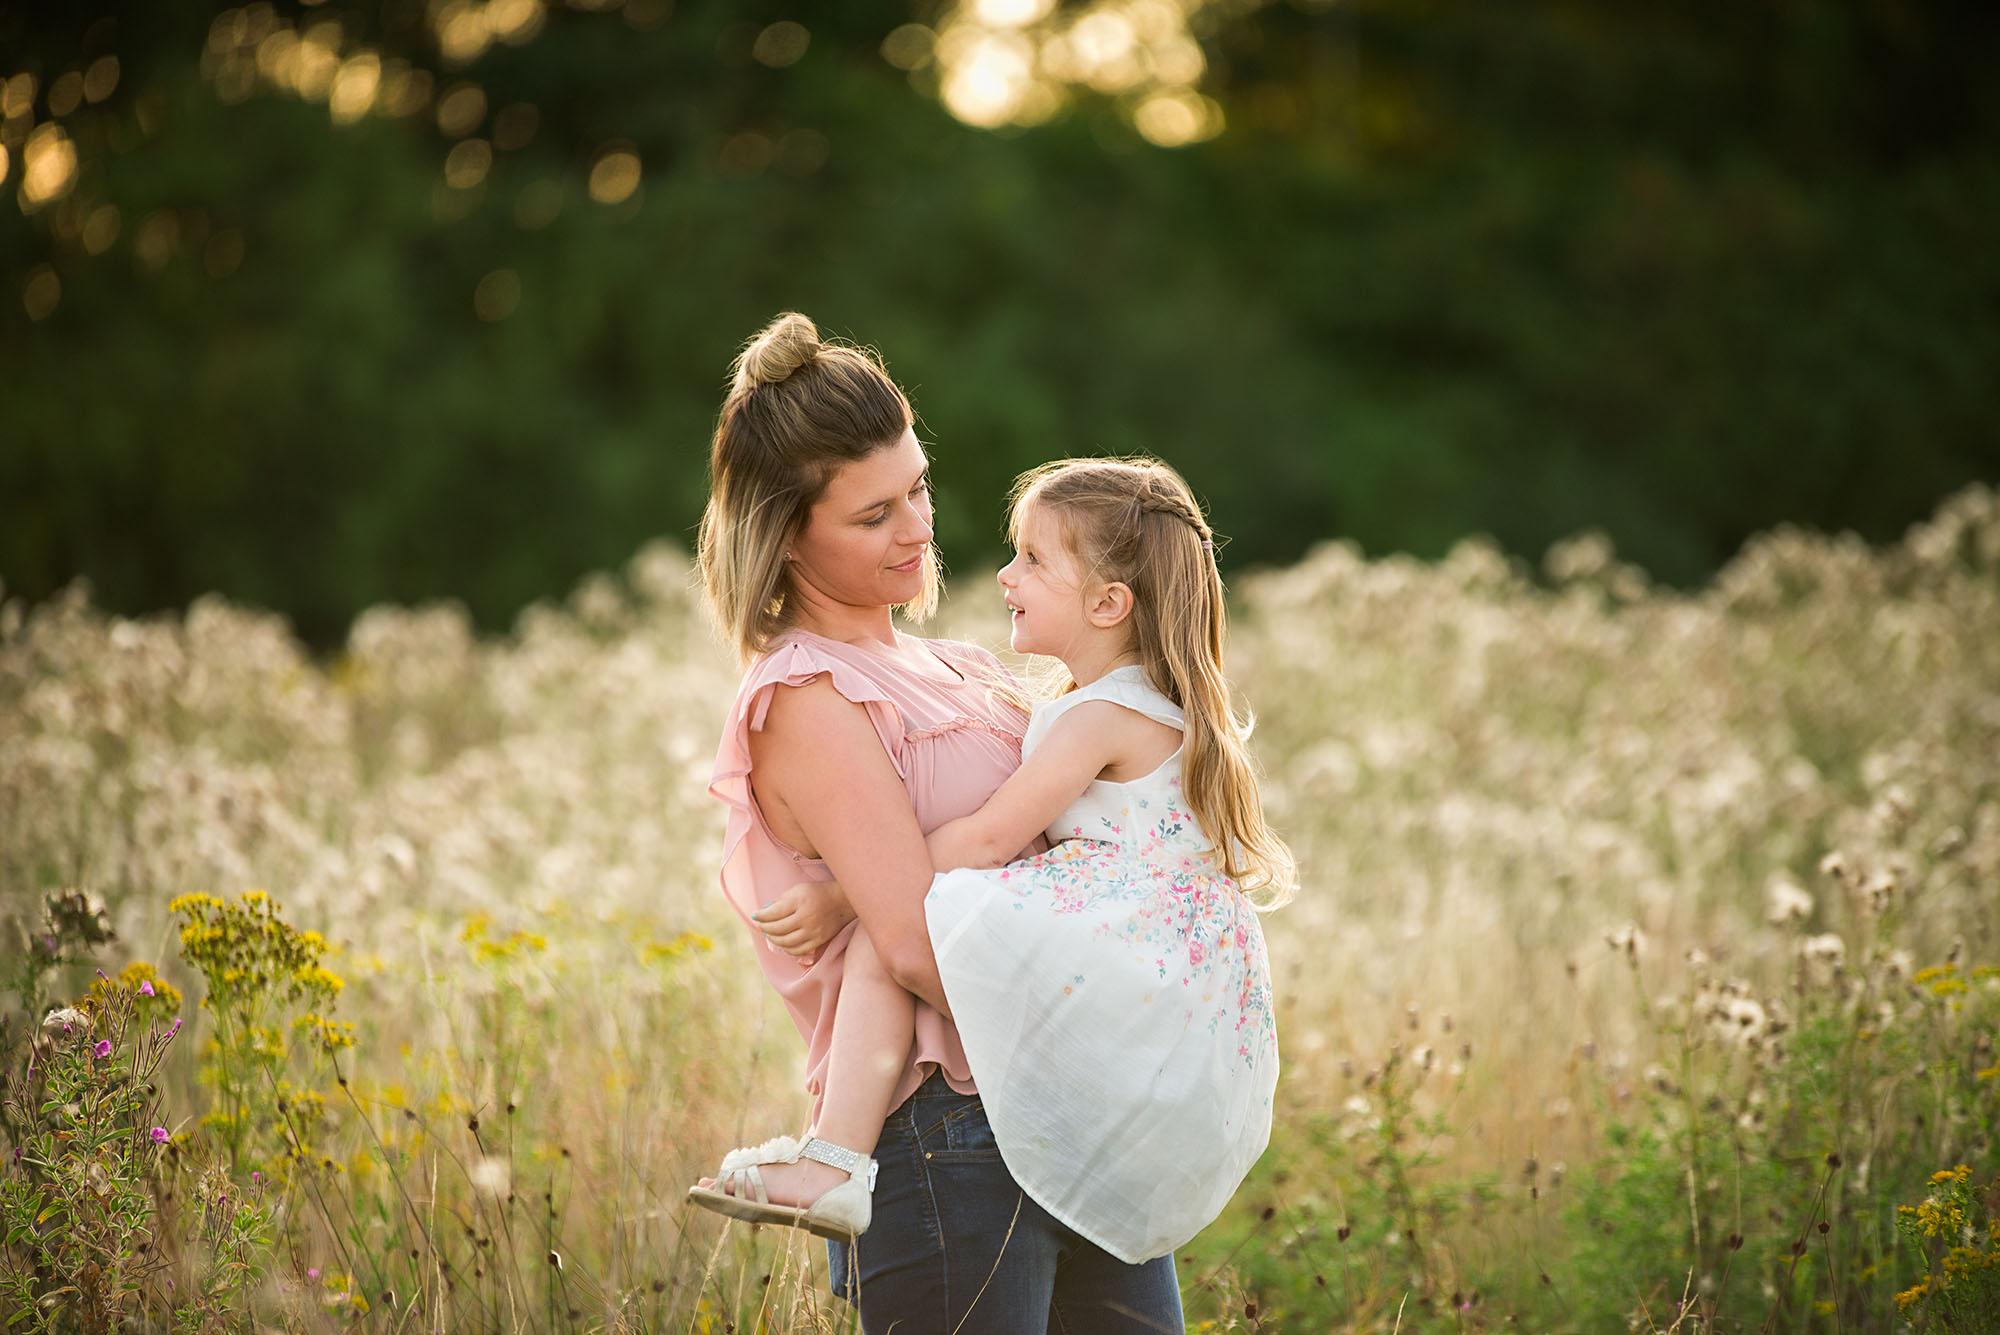 Barnsley photographer, mum and daughter sunset summer photoshoot